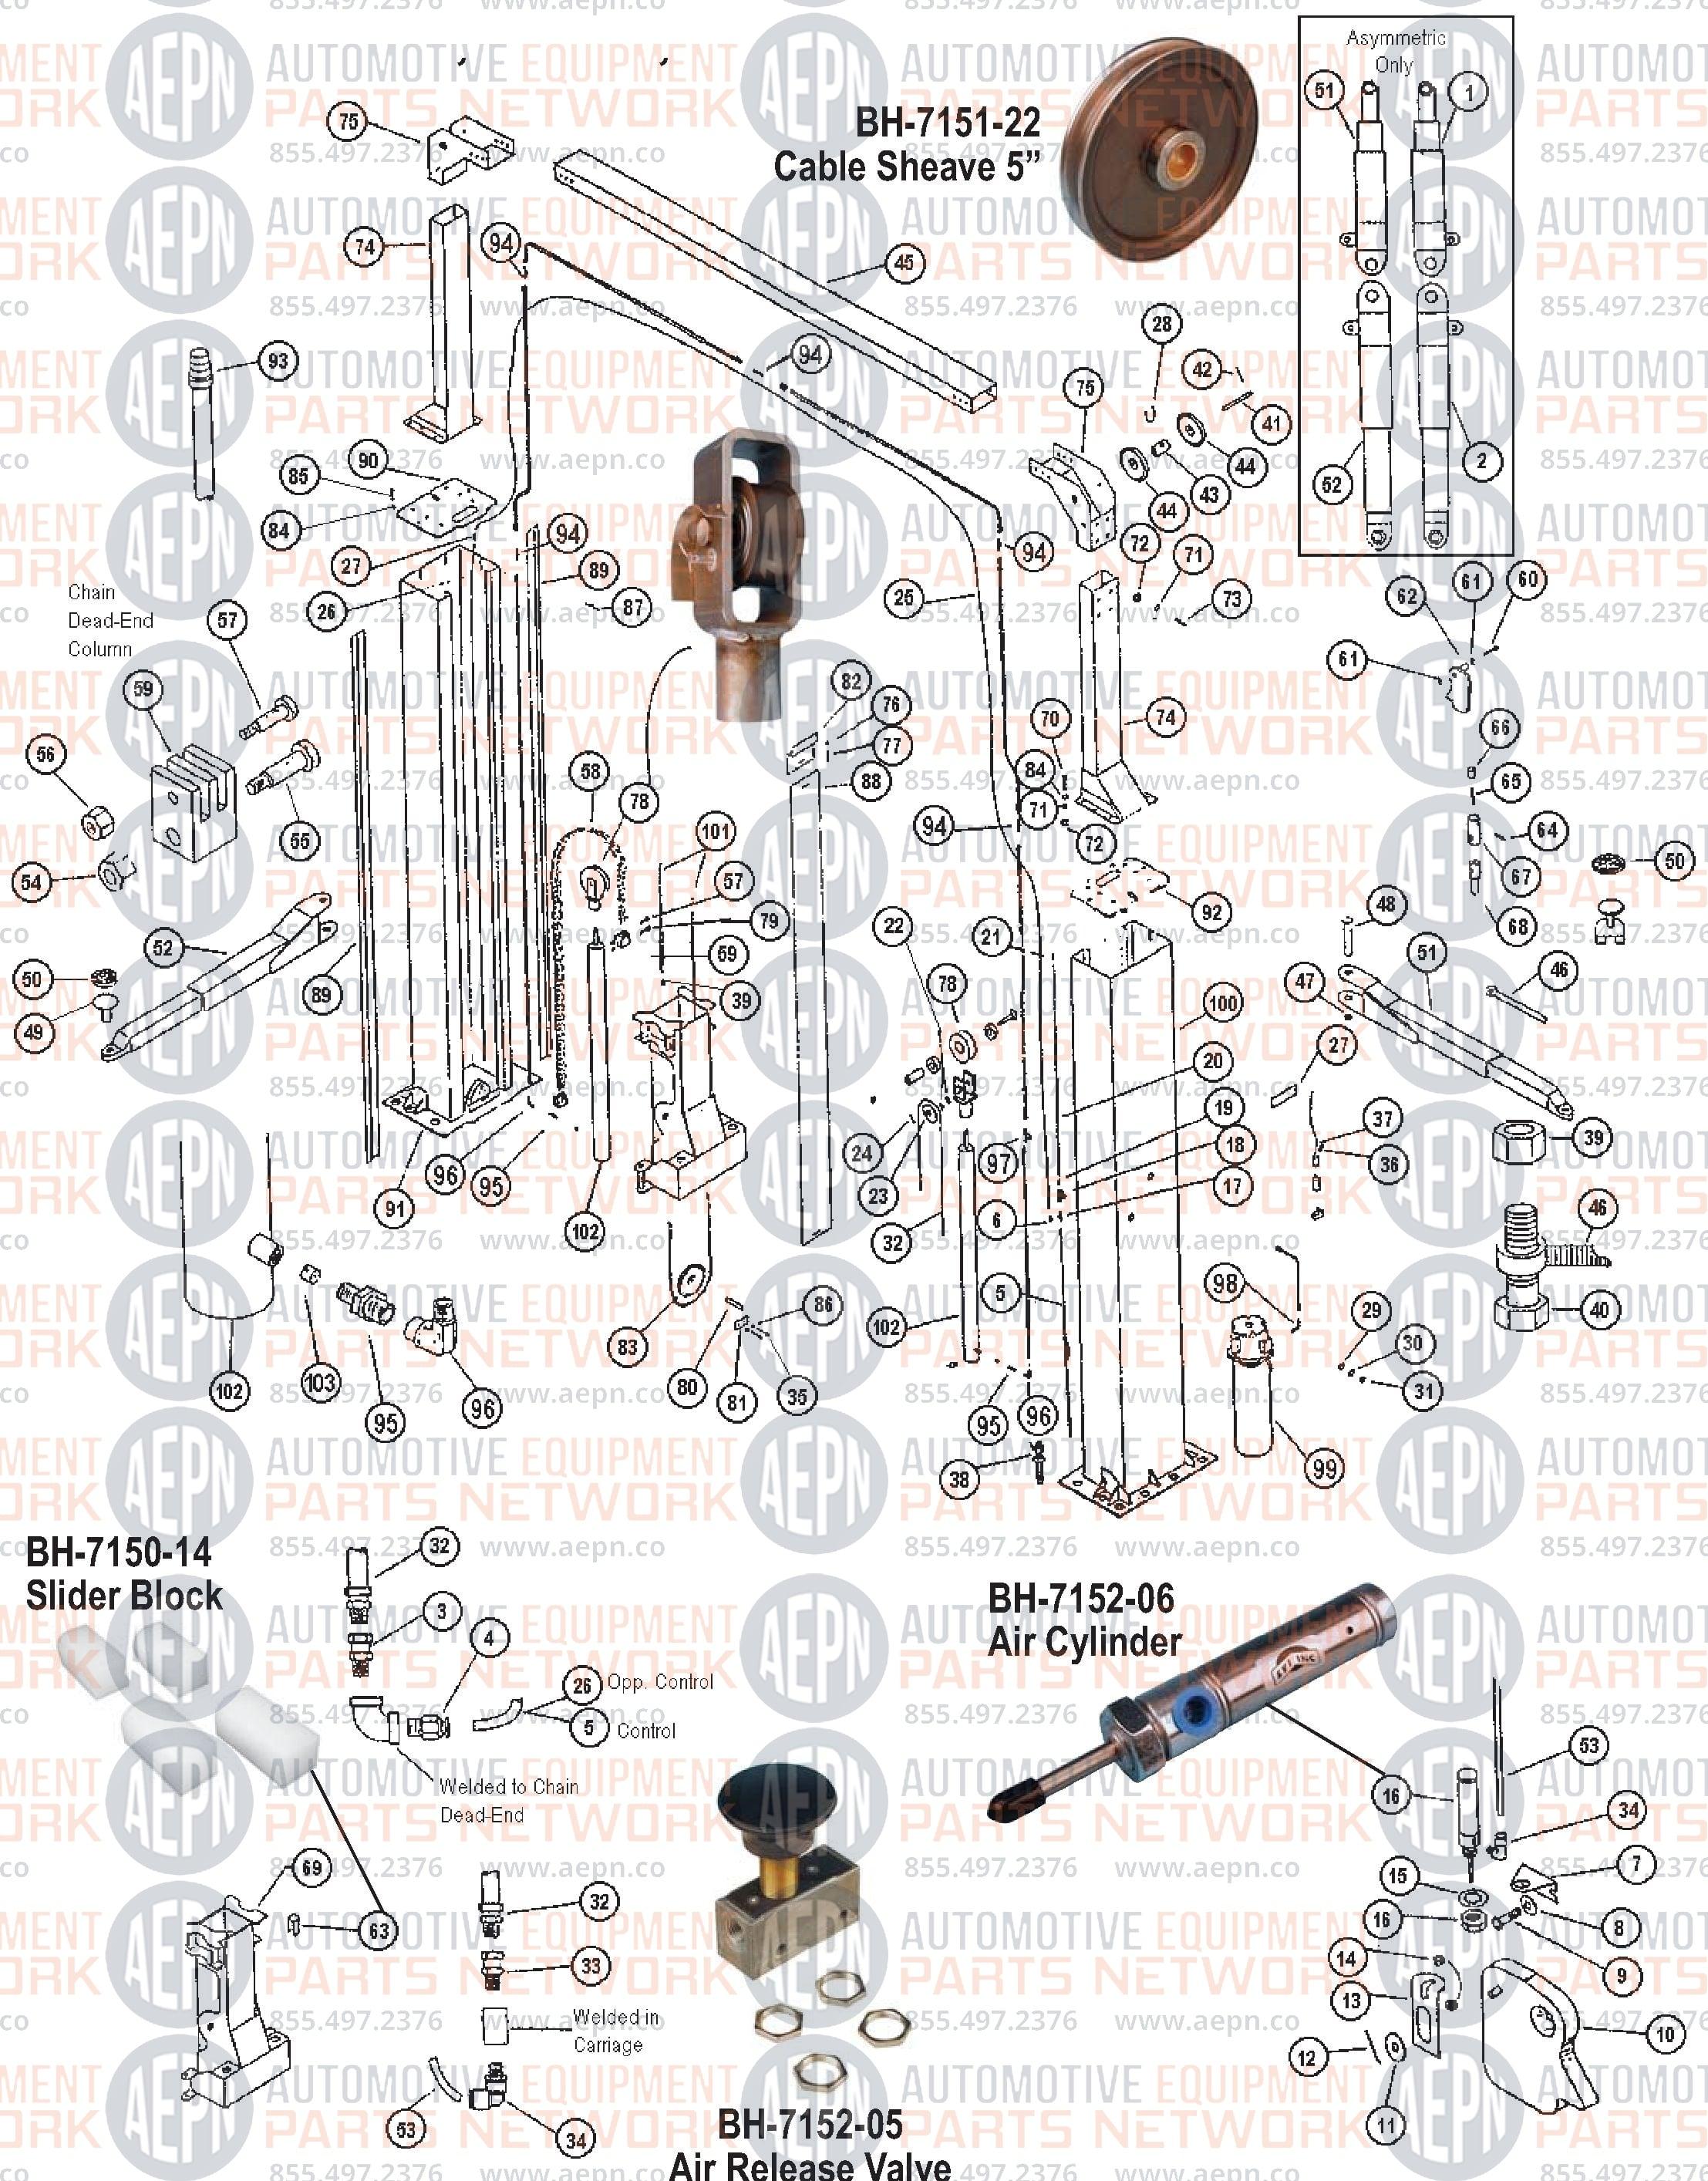 ALM 7001 Parts Breakdown